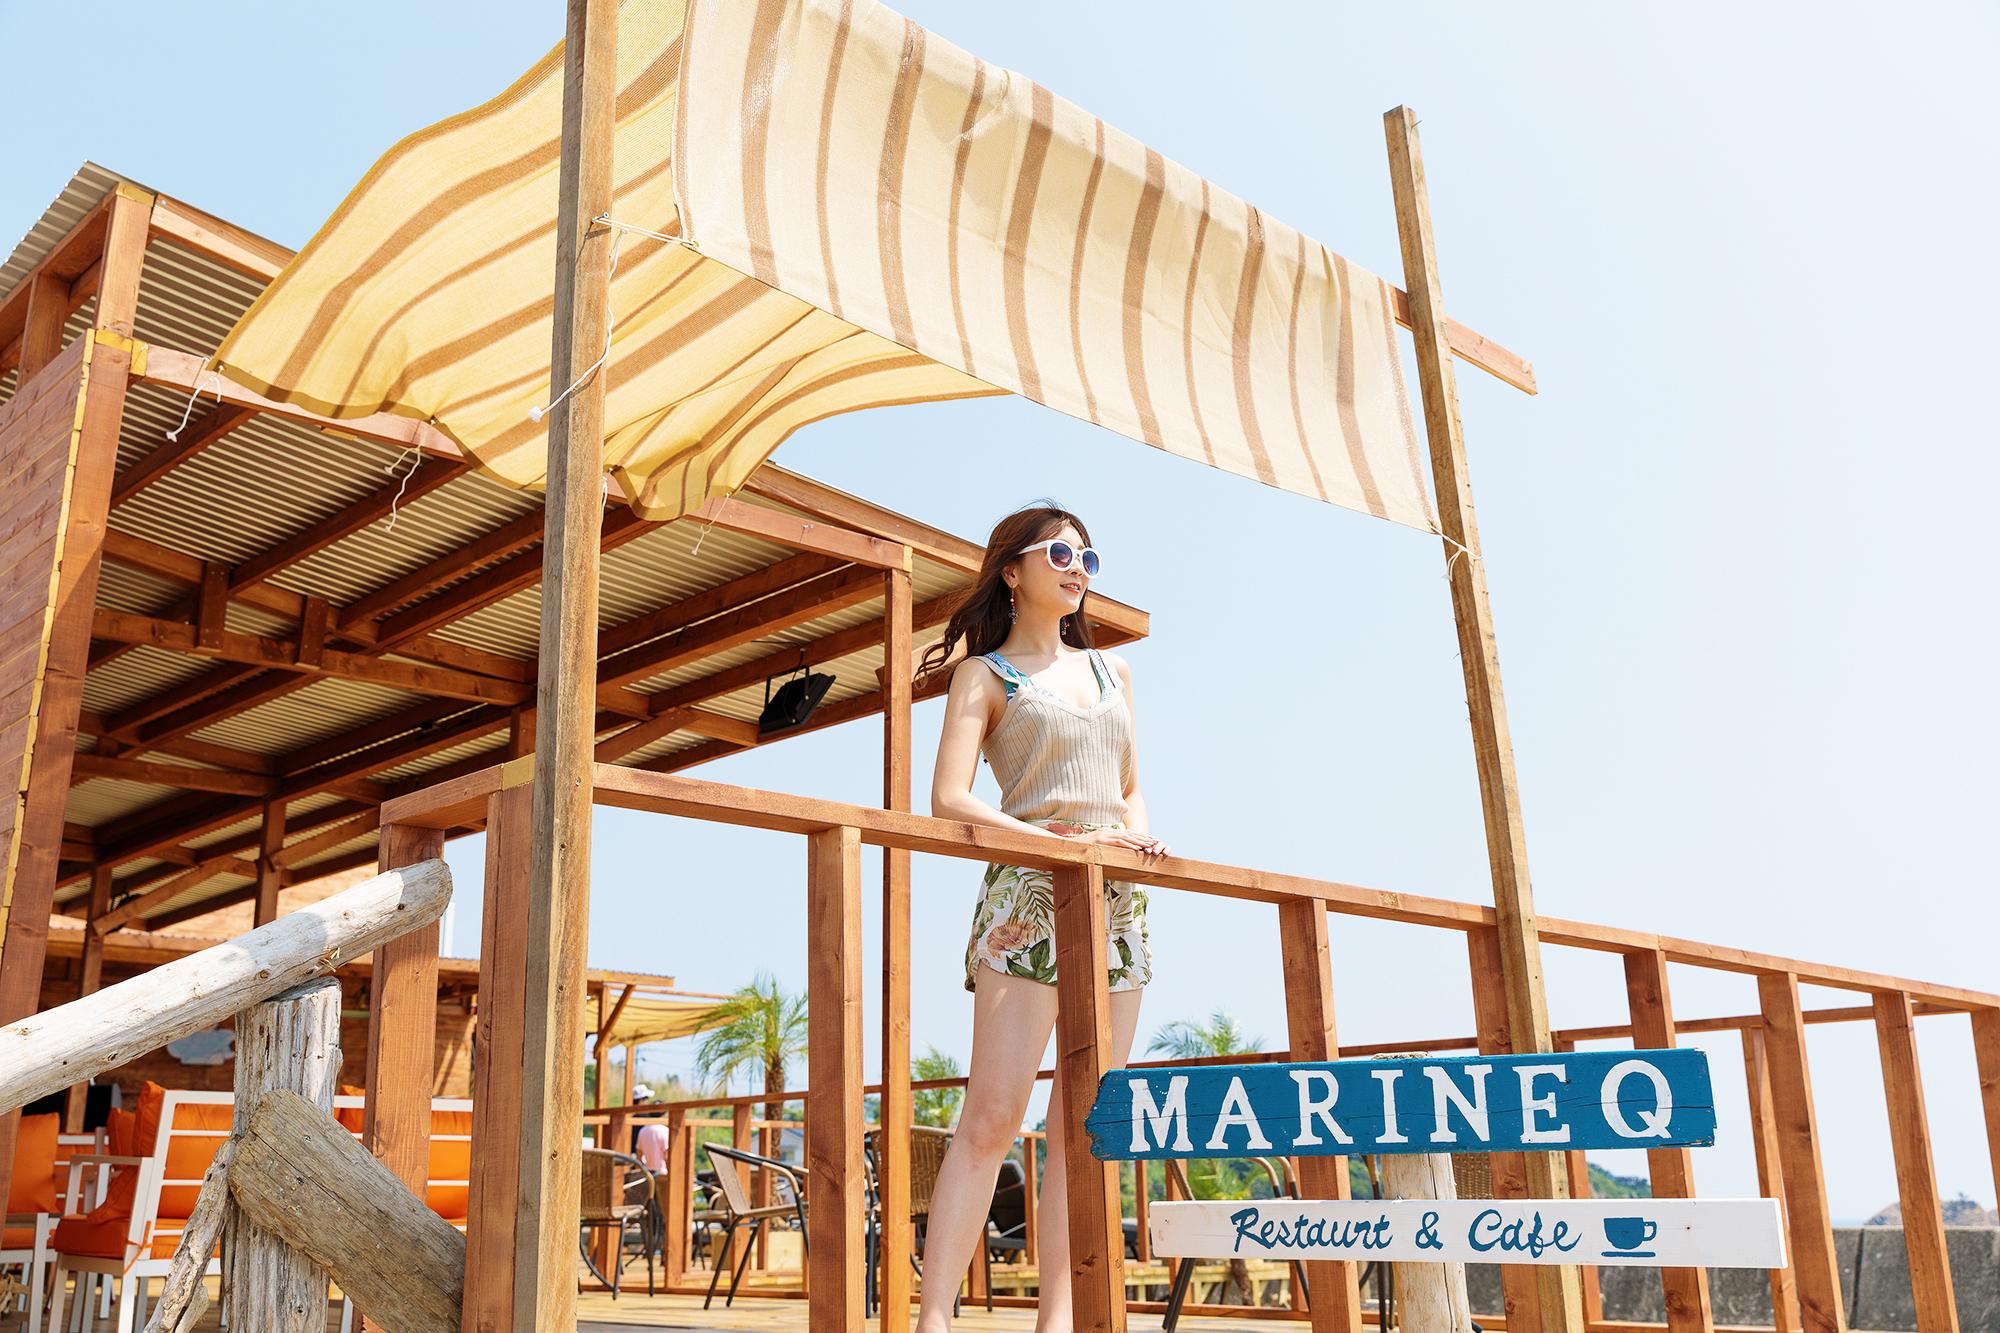 MARINE-Q(マリンキュー)